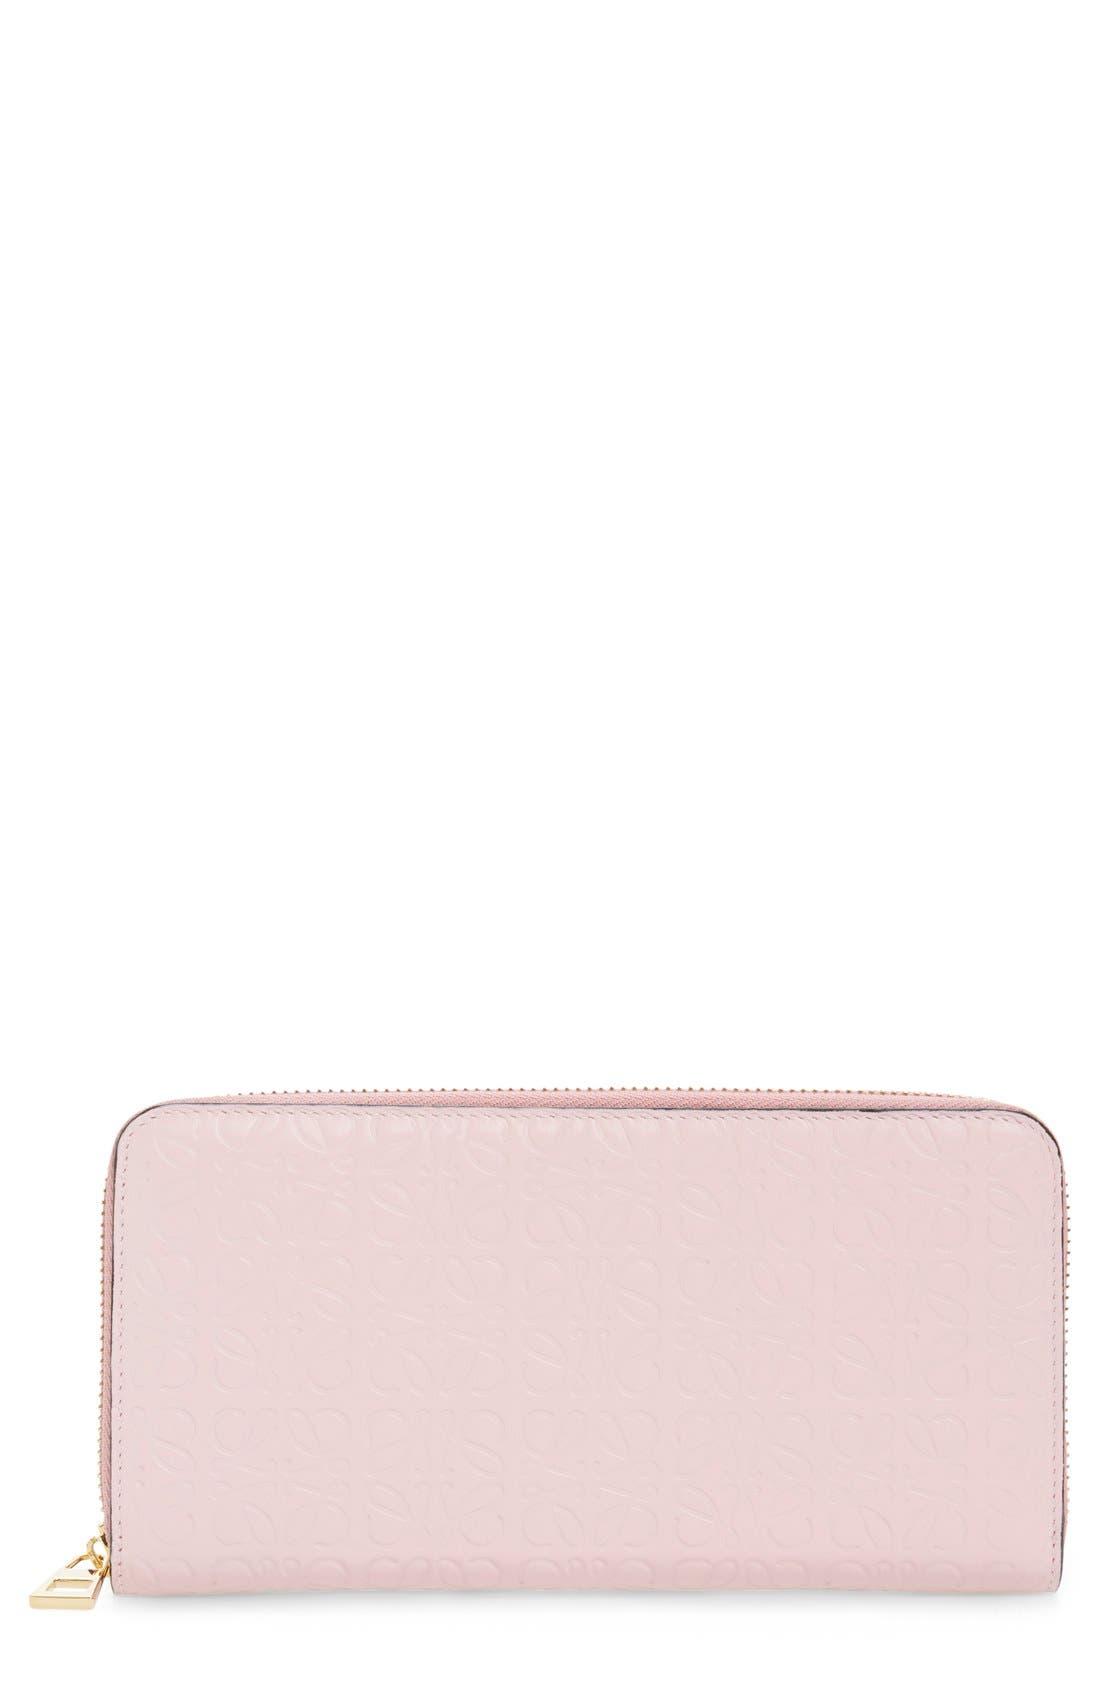 Main Image - Loewe Leather Zip Around Wallet